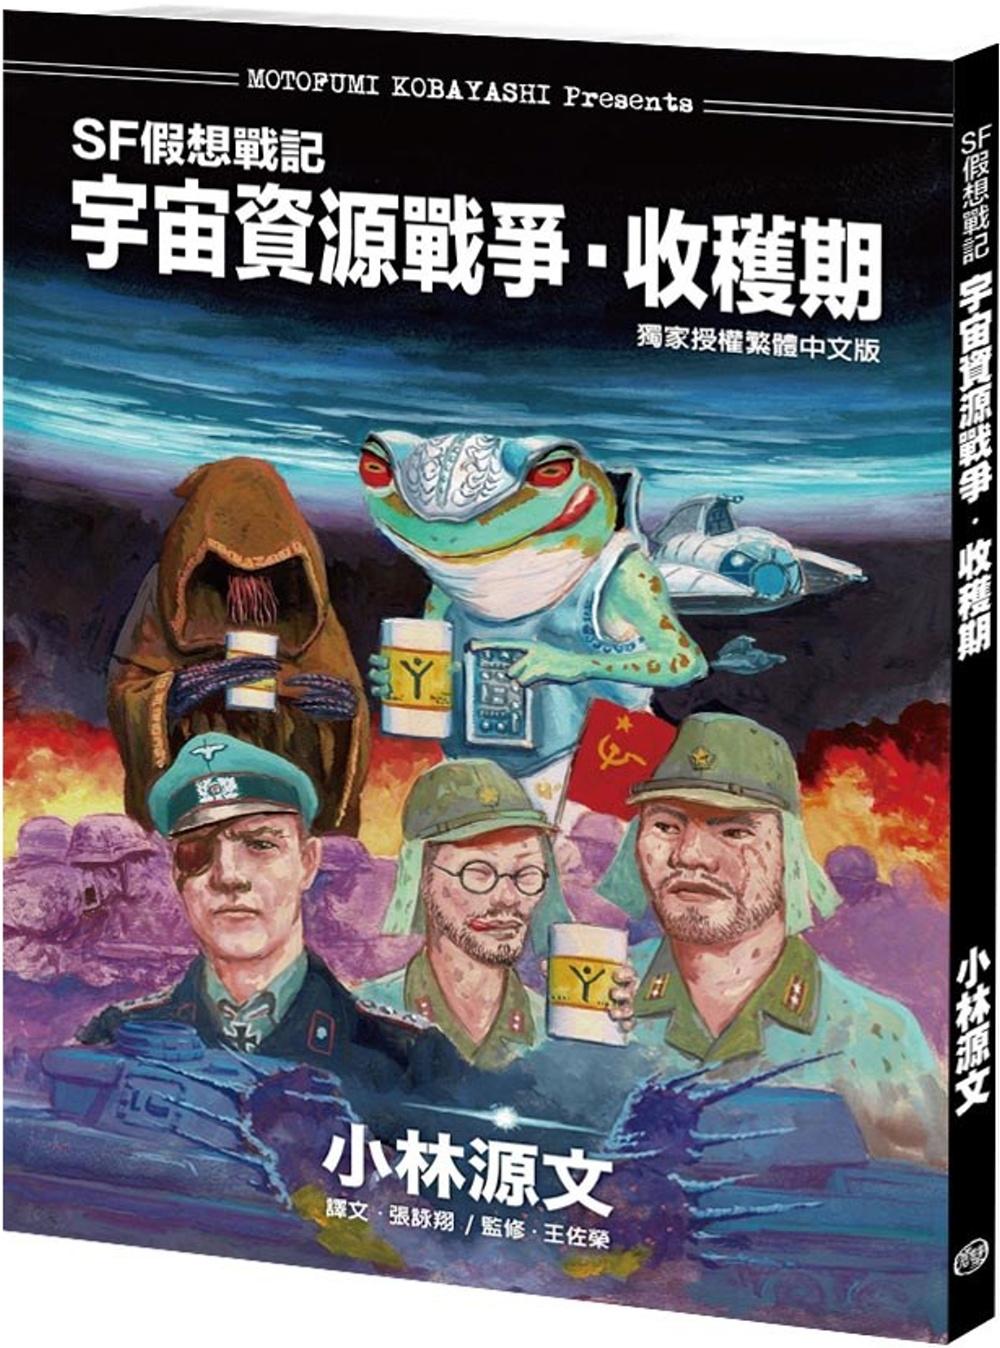 SF假想戰記:宇宙資源戰爭‧收穫期(A4大開本)